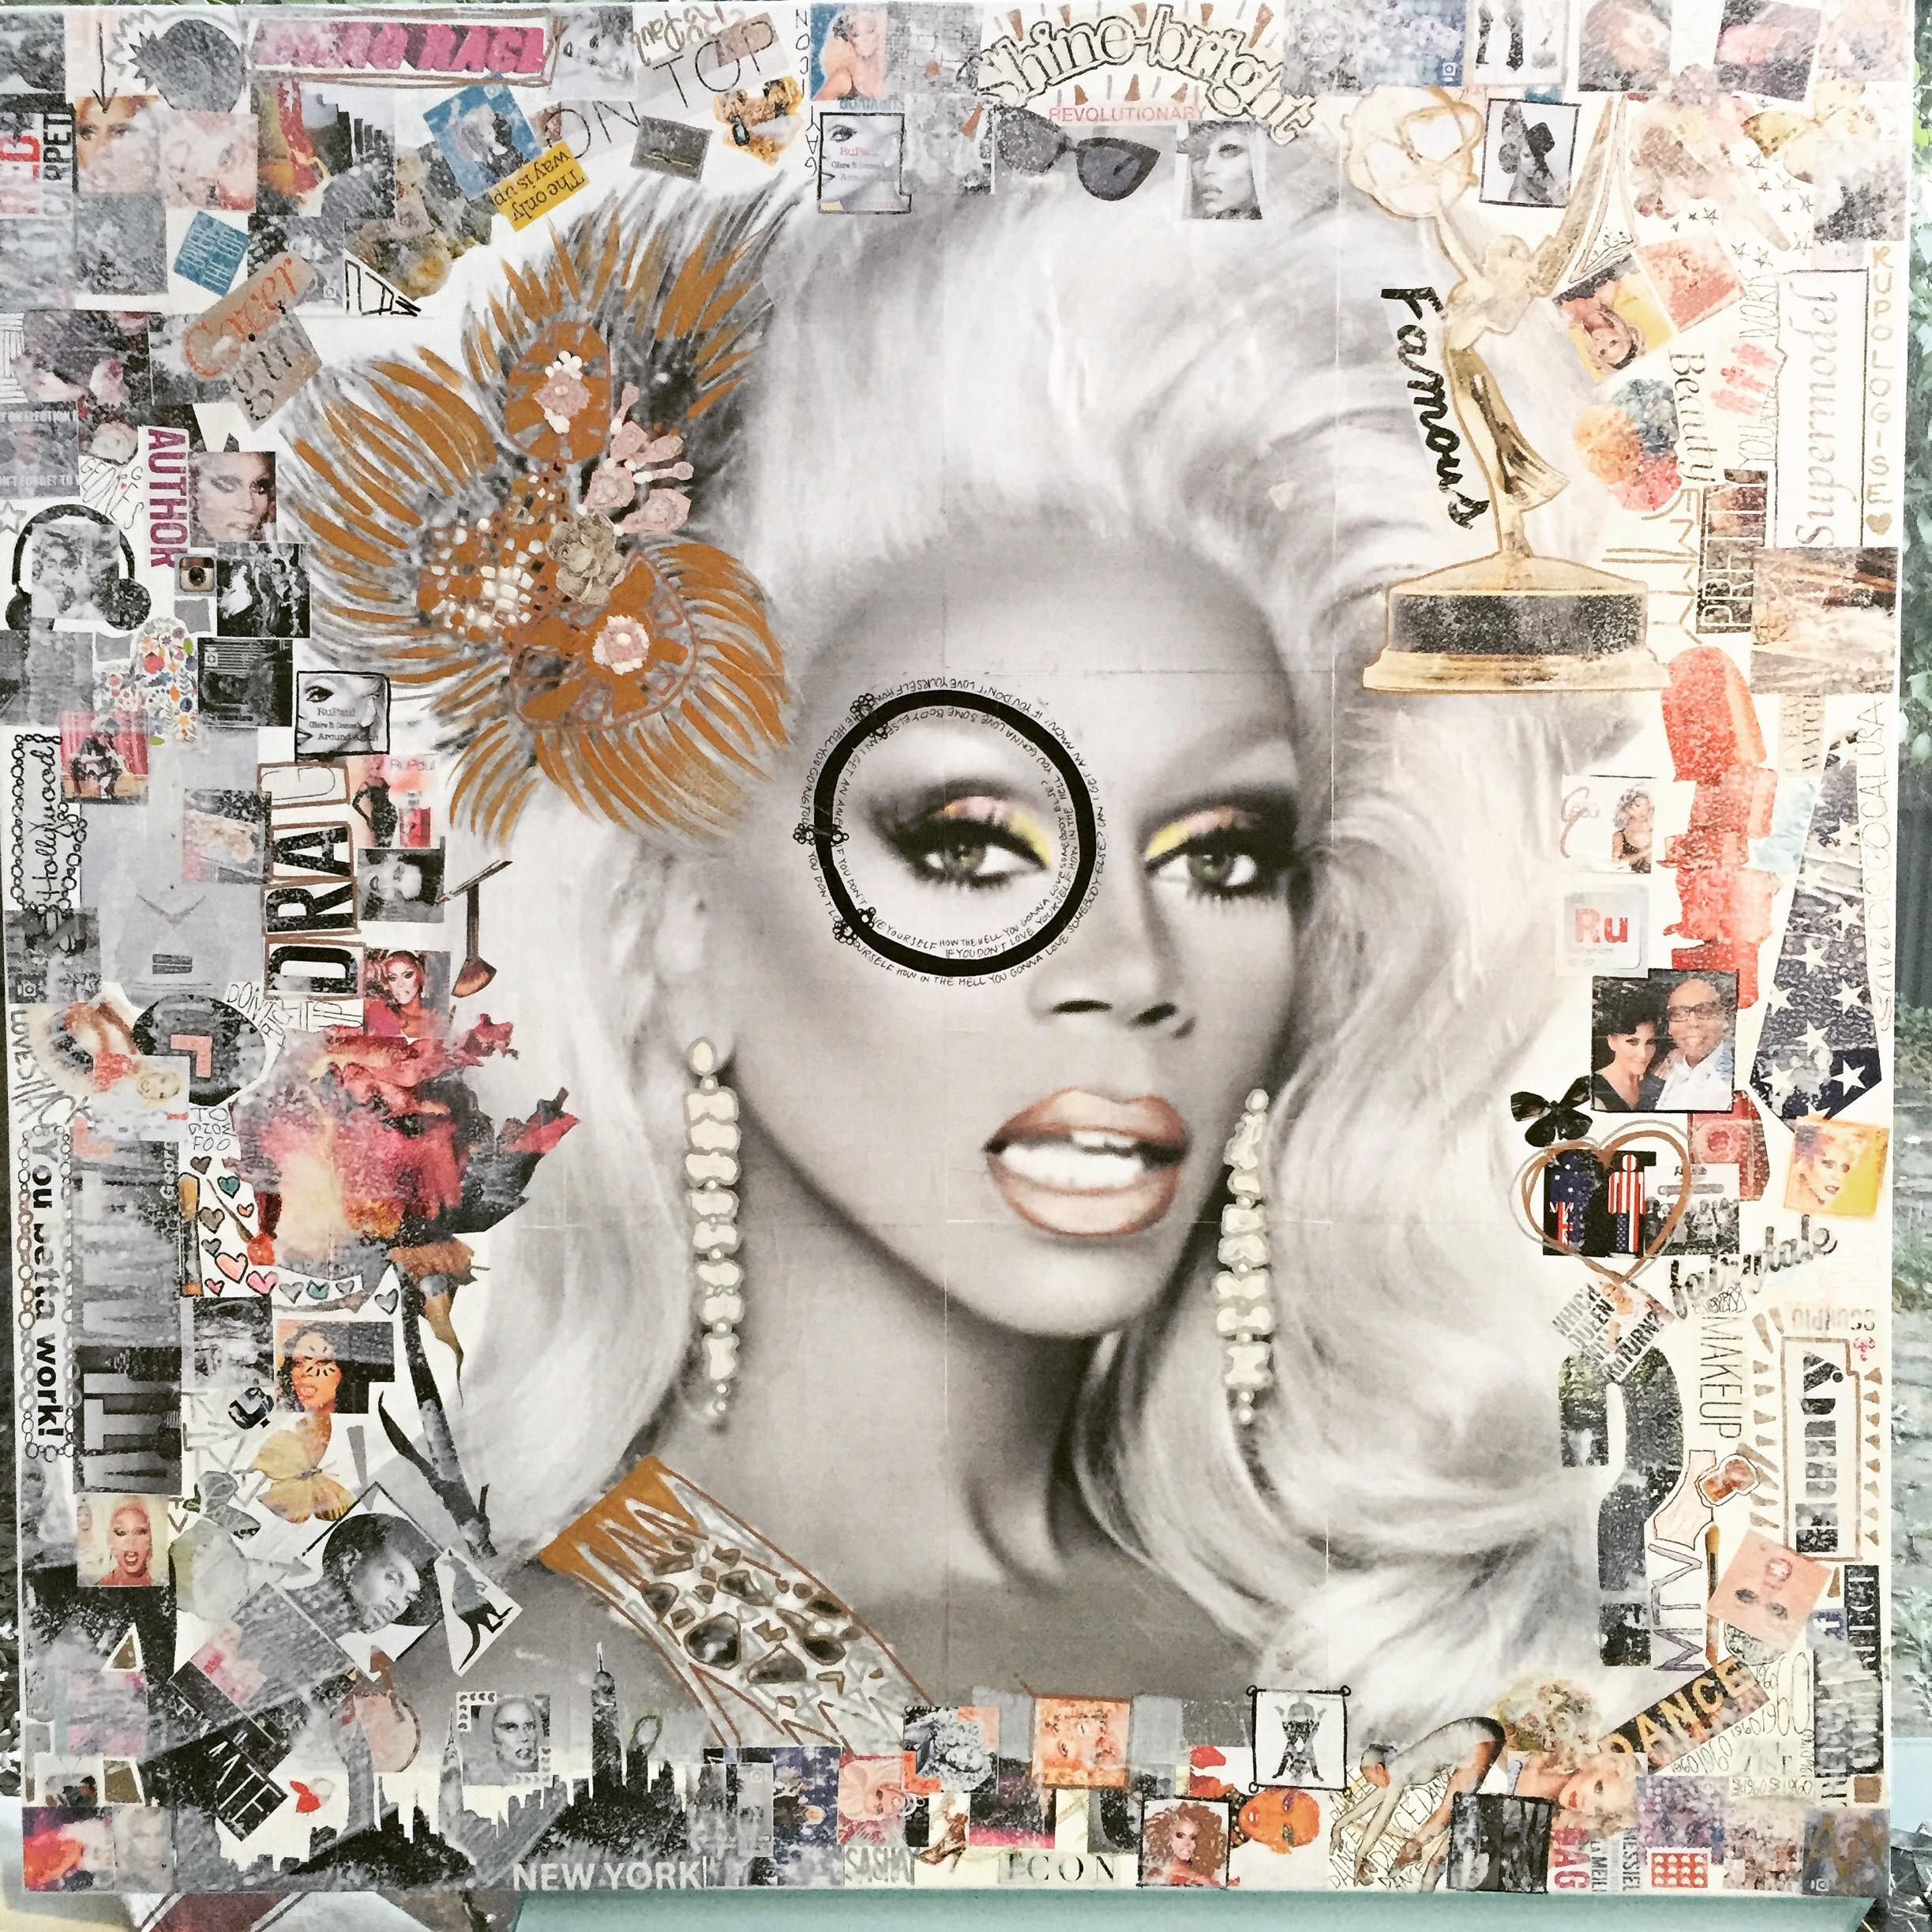 RuPaul Supermodel. Collage Canv - antadams | ello